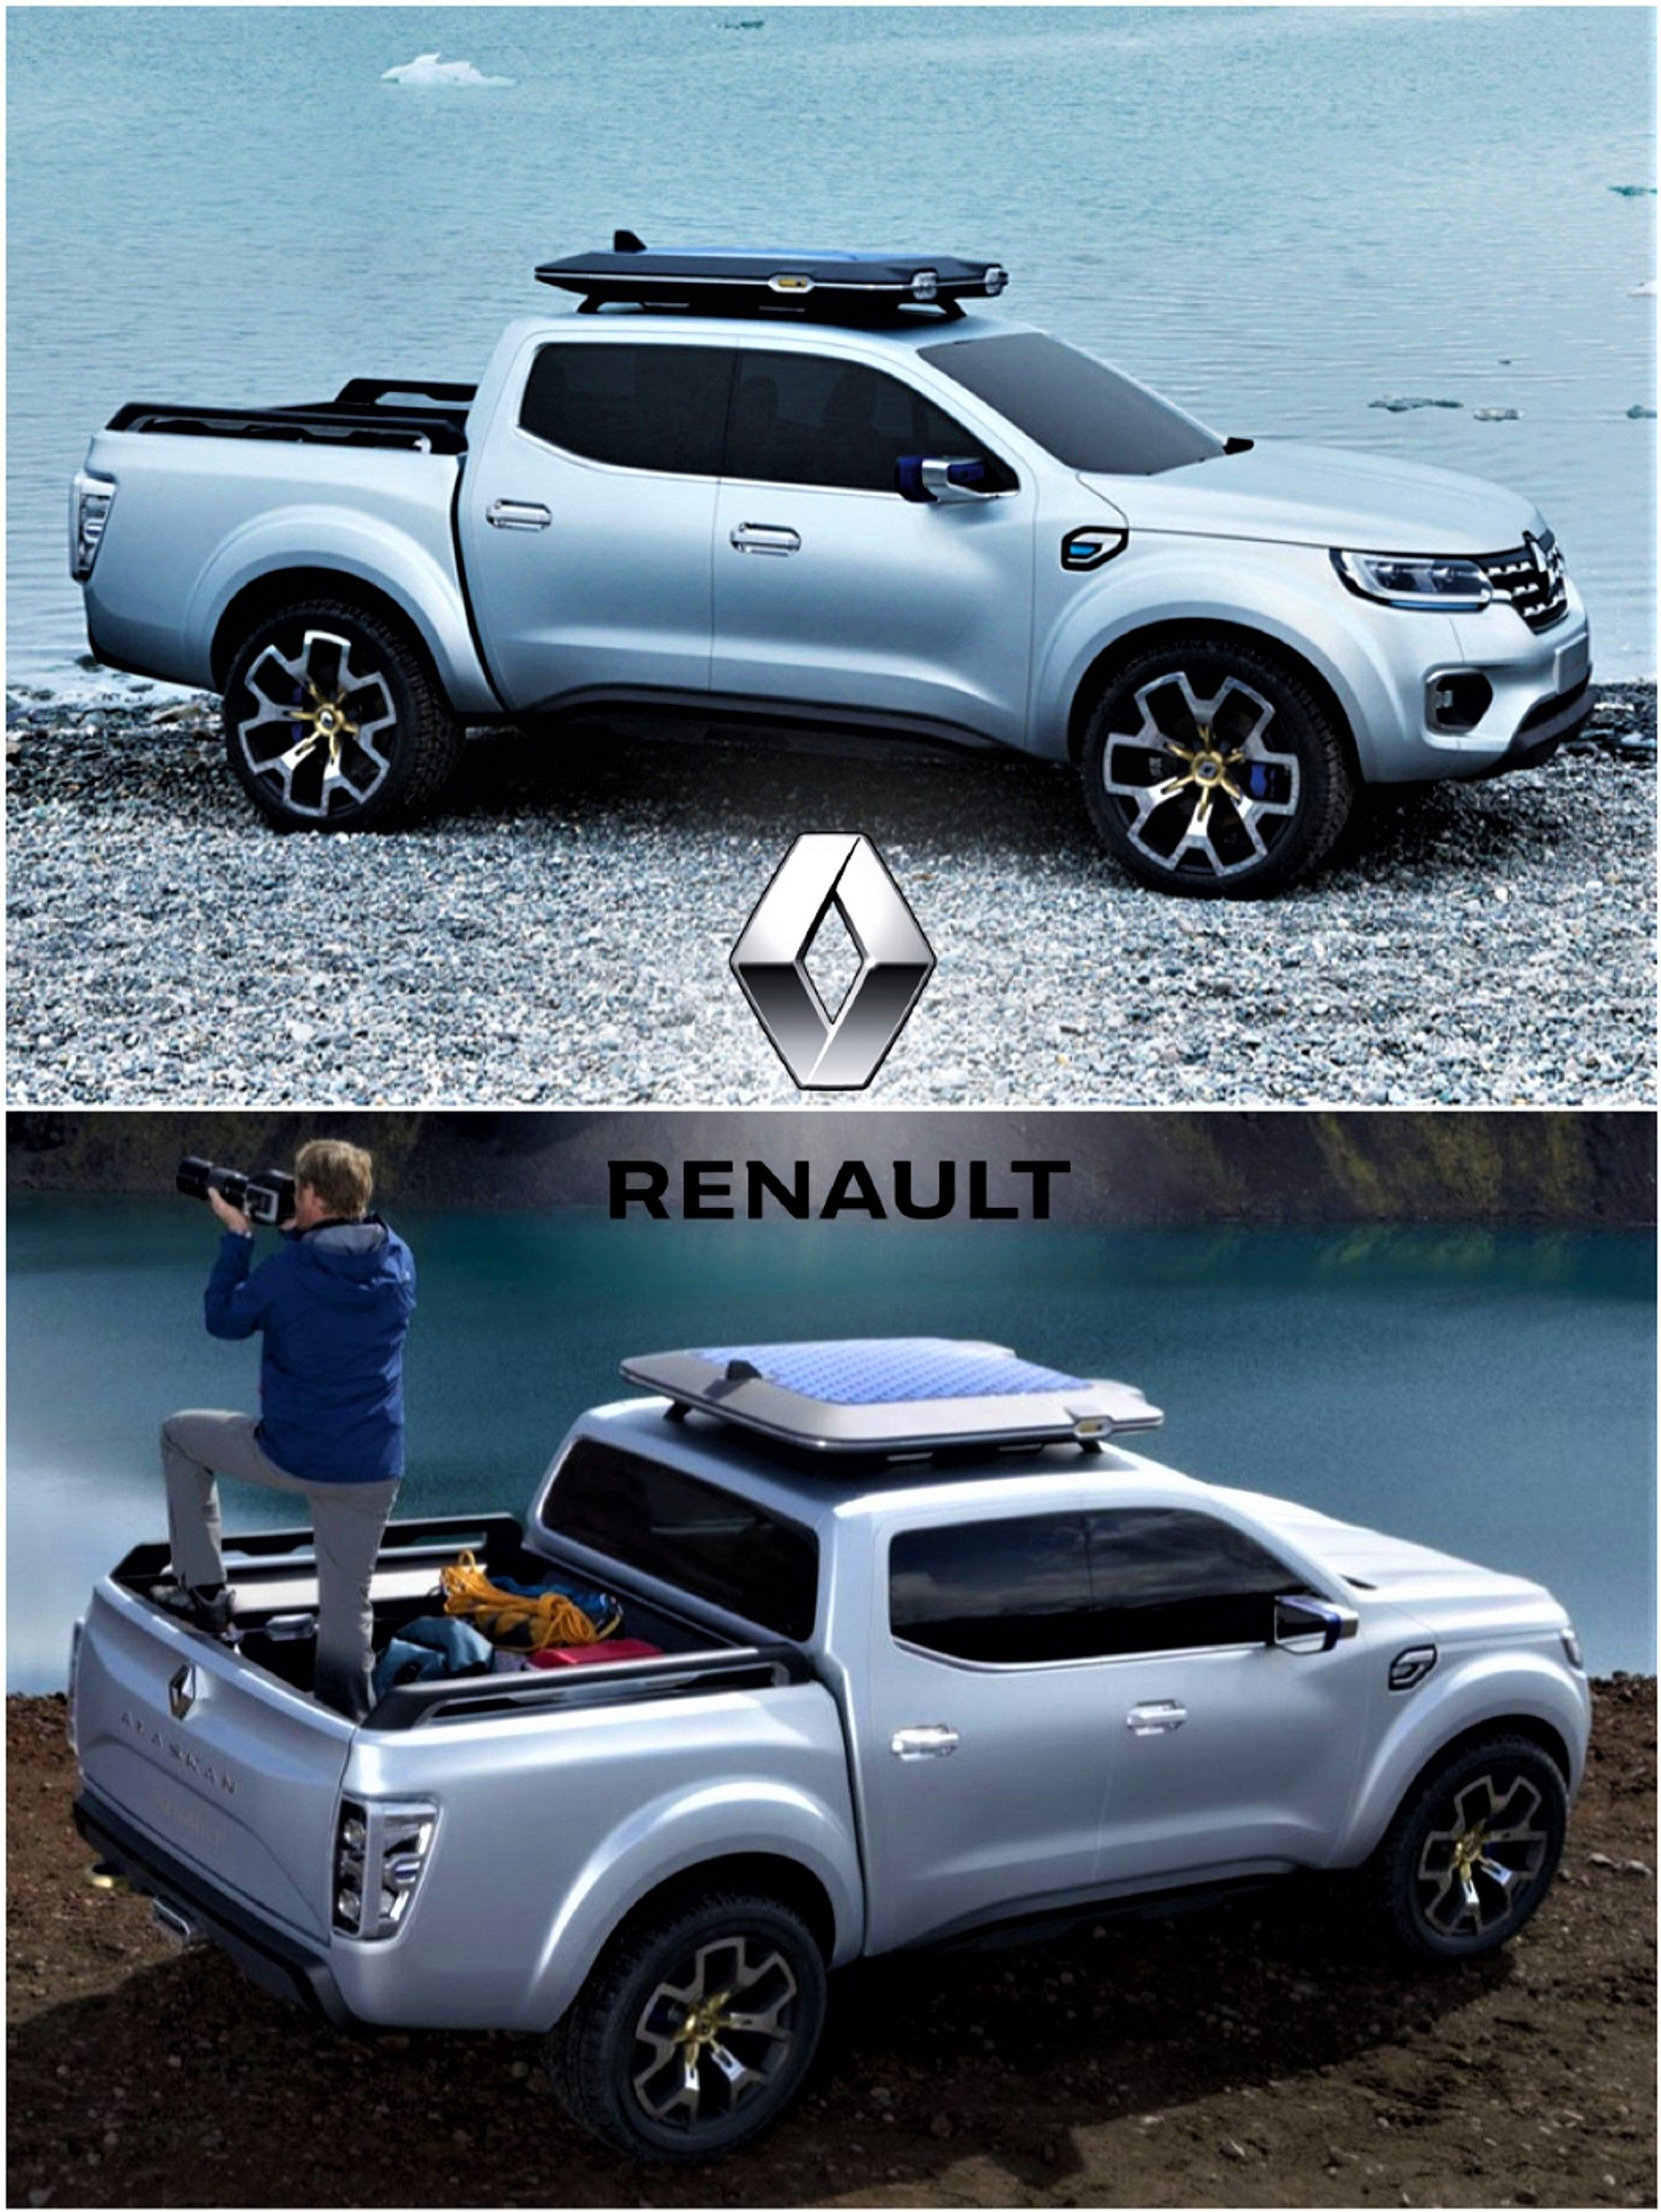 2018 Renault Alaskan Concept Http Renault Co Uk Vehicles